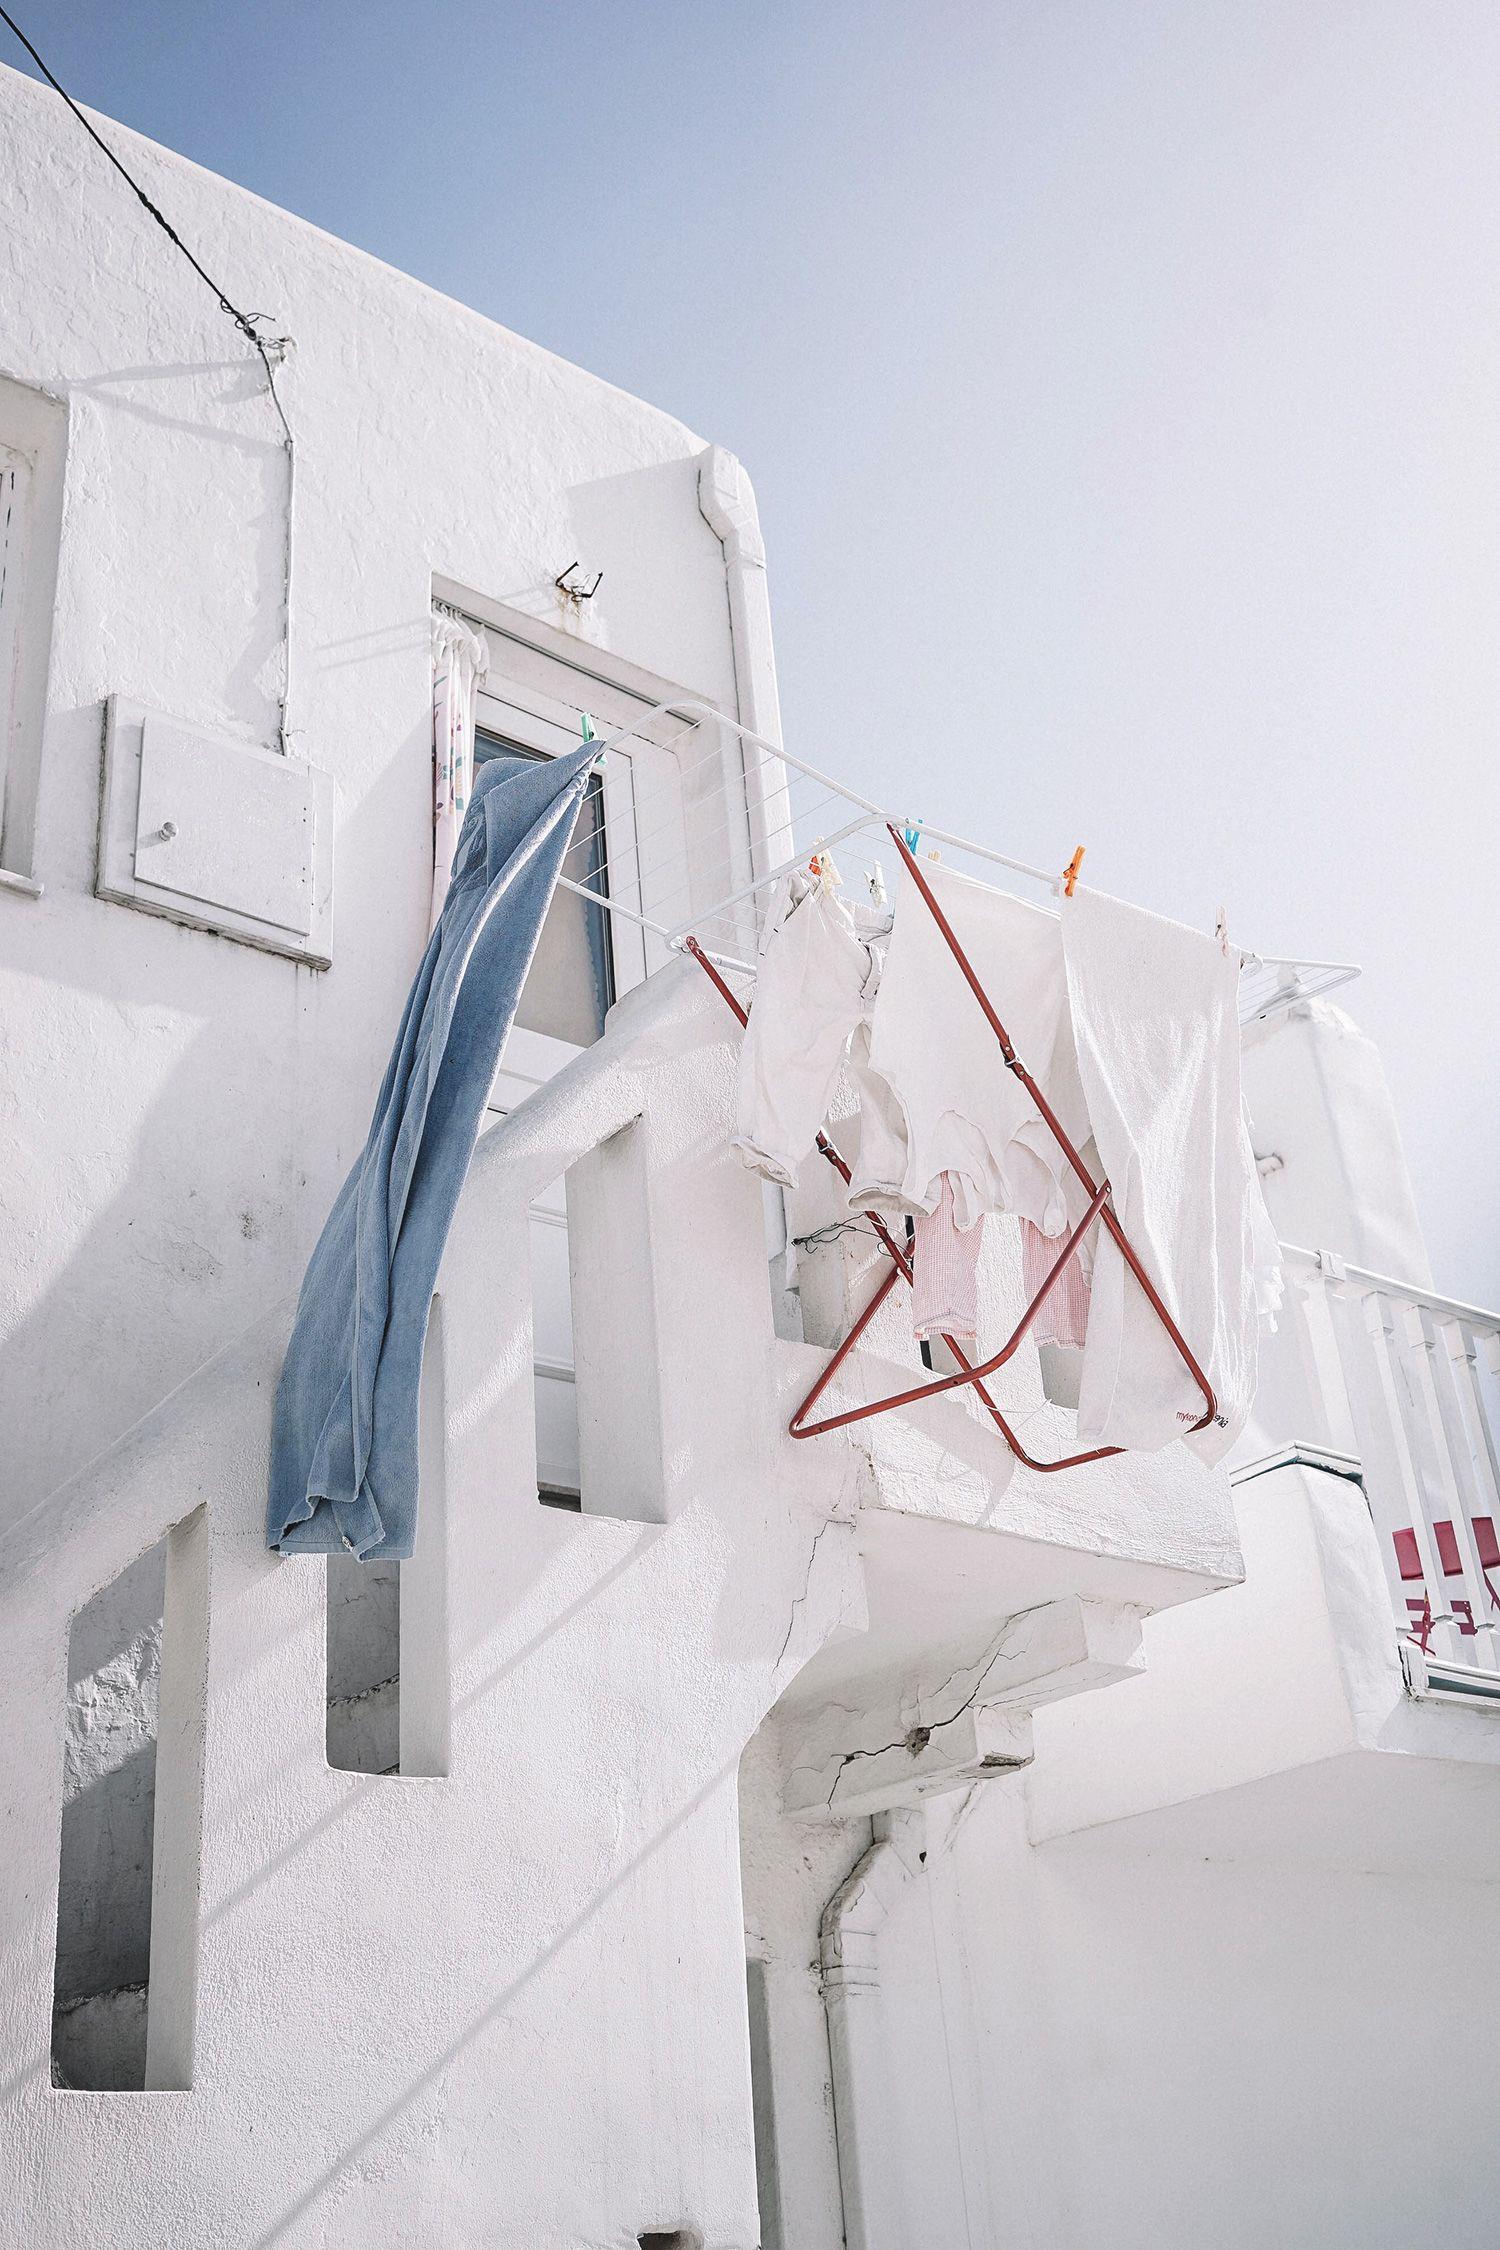 Lace_up_Blouse-Ralph_Lauren-Soludos_Espadrilles-Soludos_Escapes-Skirt-Straw_Hat-Canotier-Lack_Of_Color-Street_Style-Mykonos-Greece-Collage_Vintage-123